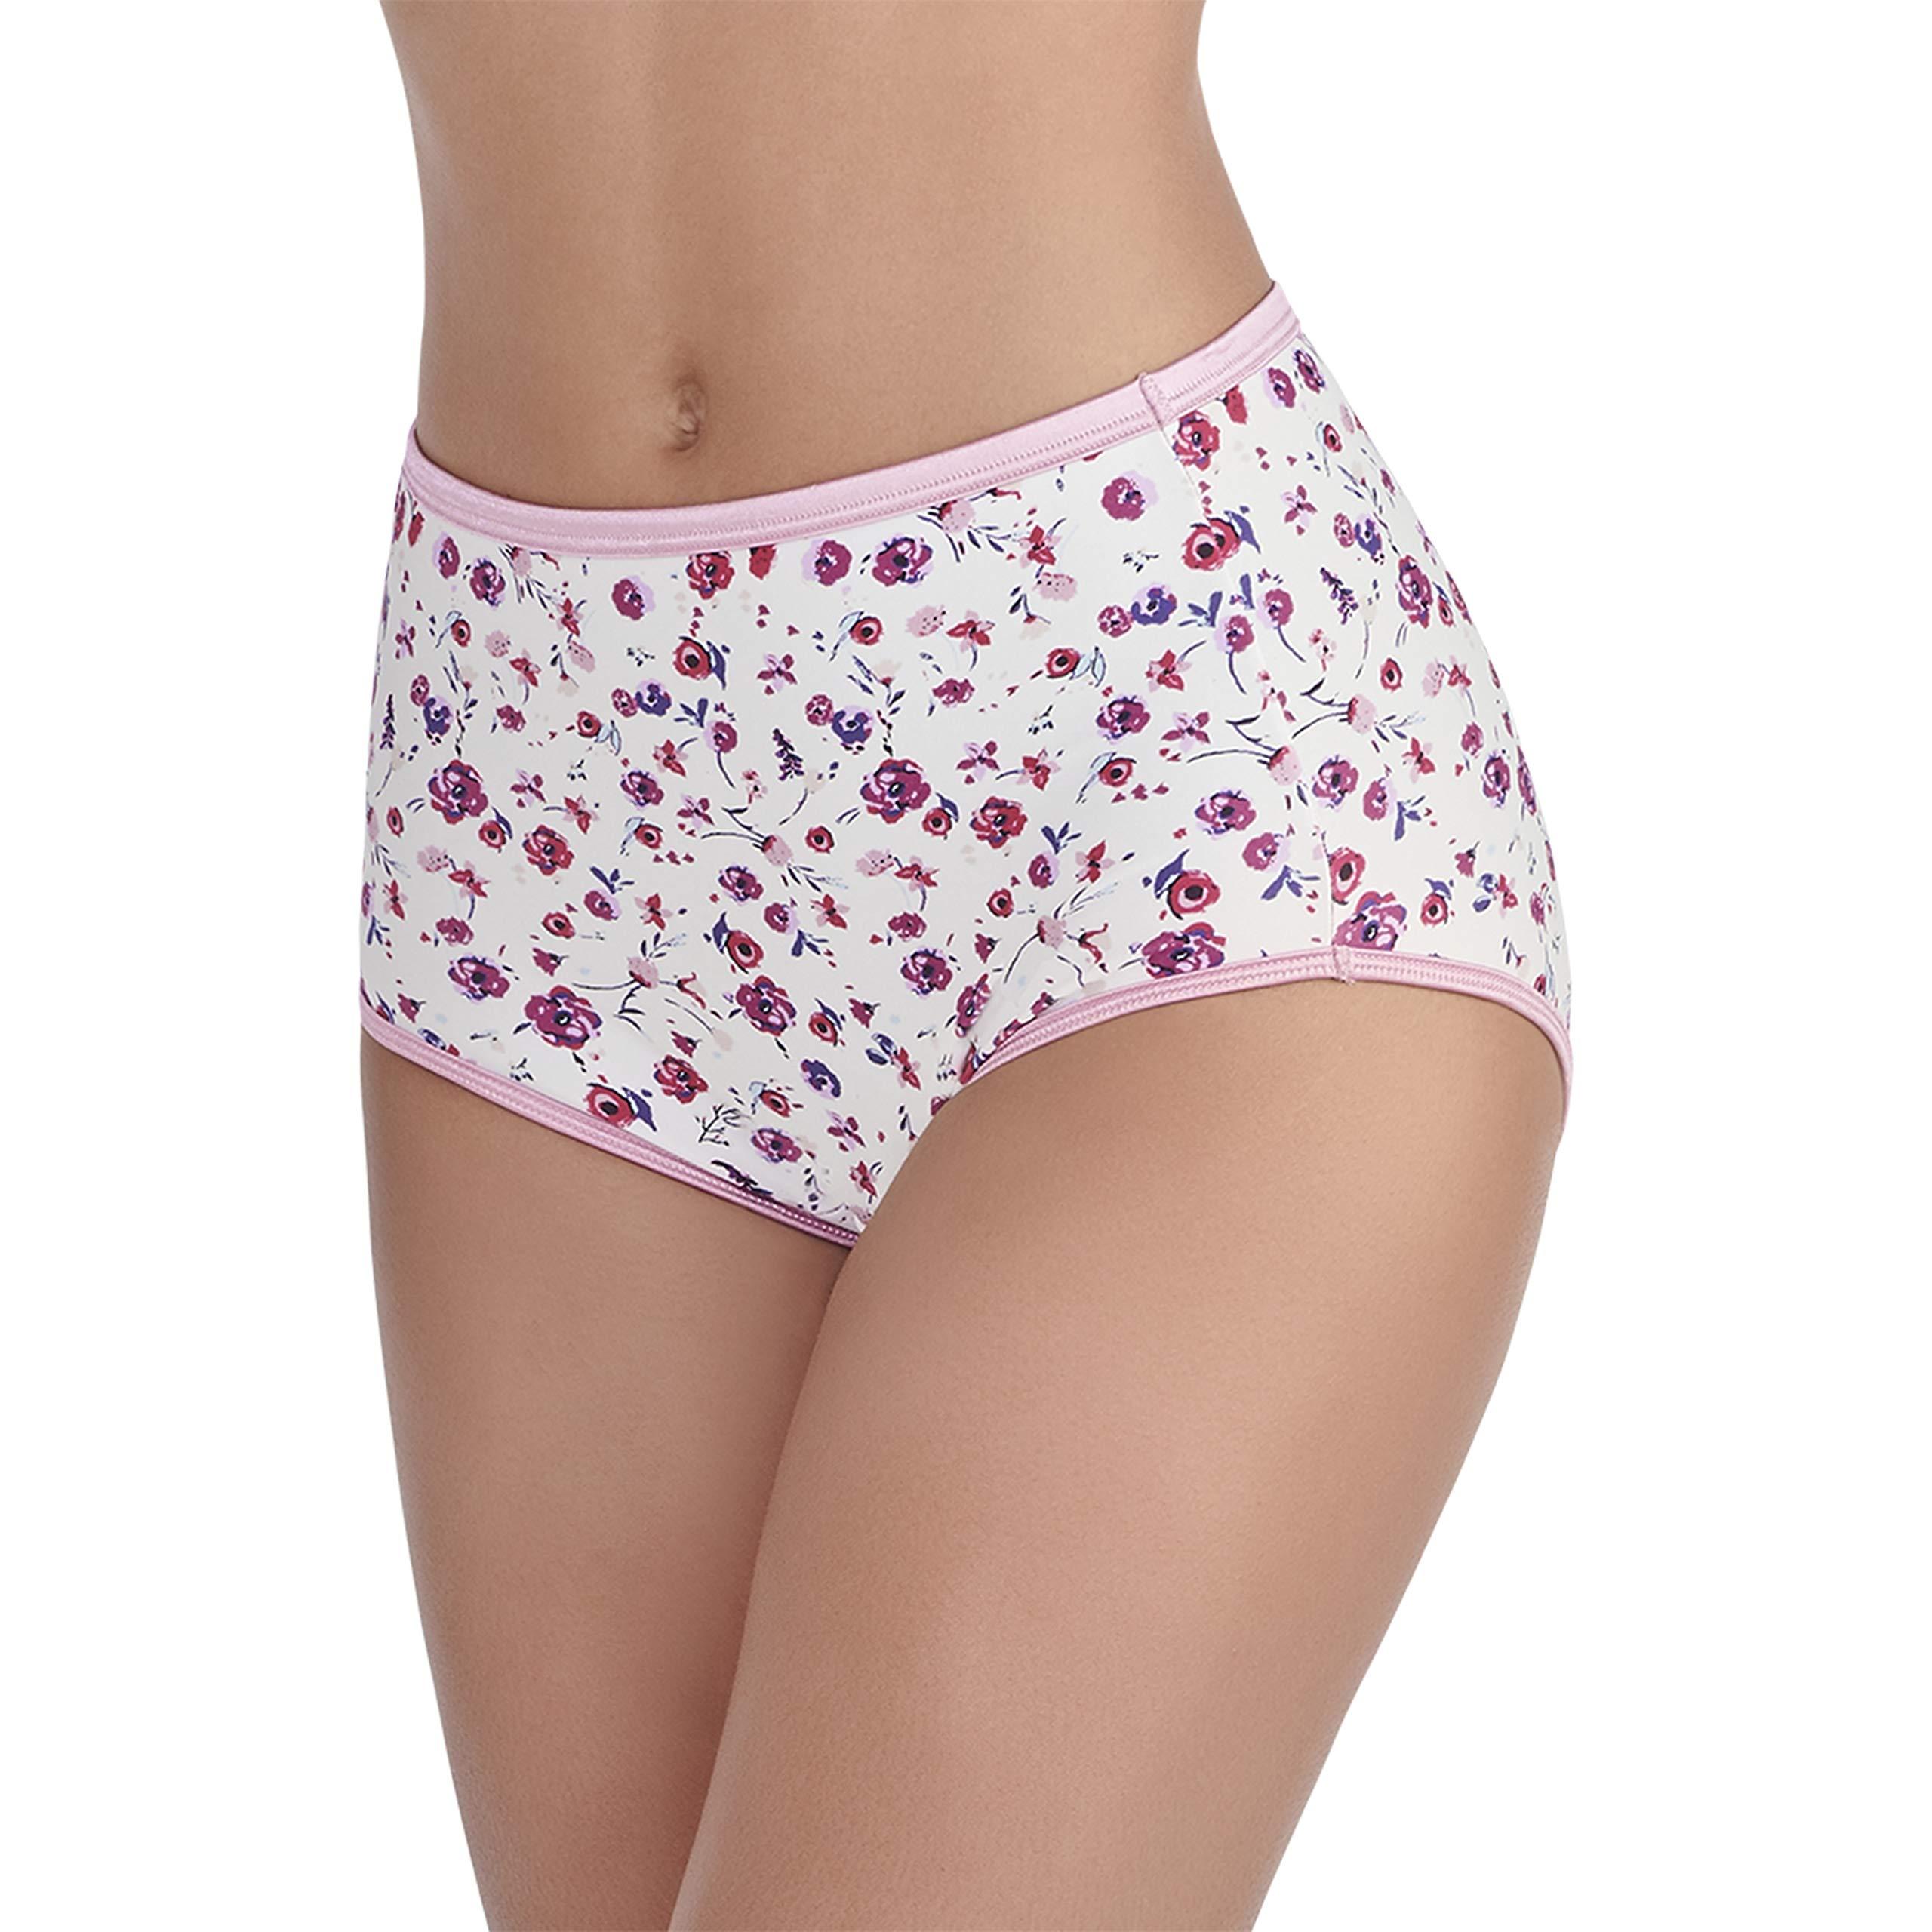 fcd9dfe4d68b Best Rated in Women's Panties & Helpful Customer Reviews - Amazon.com